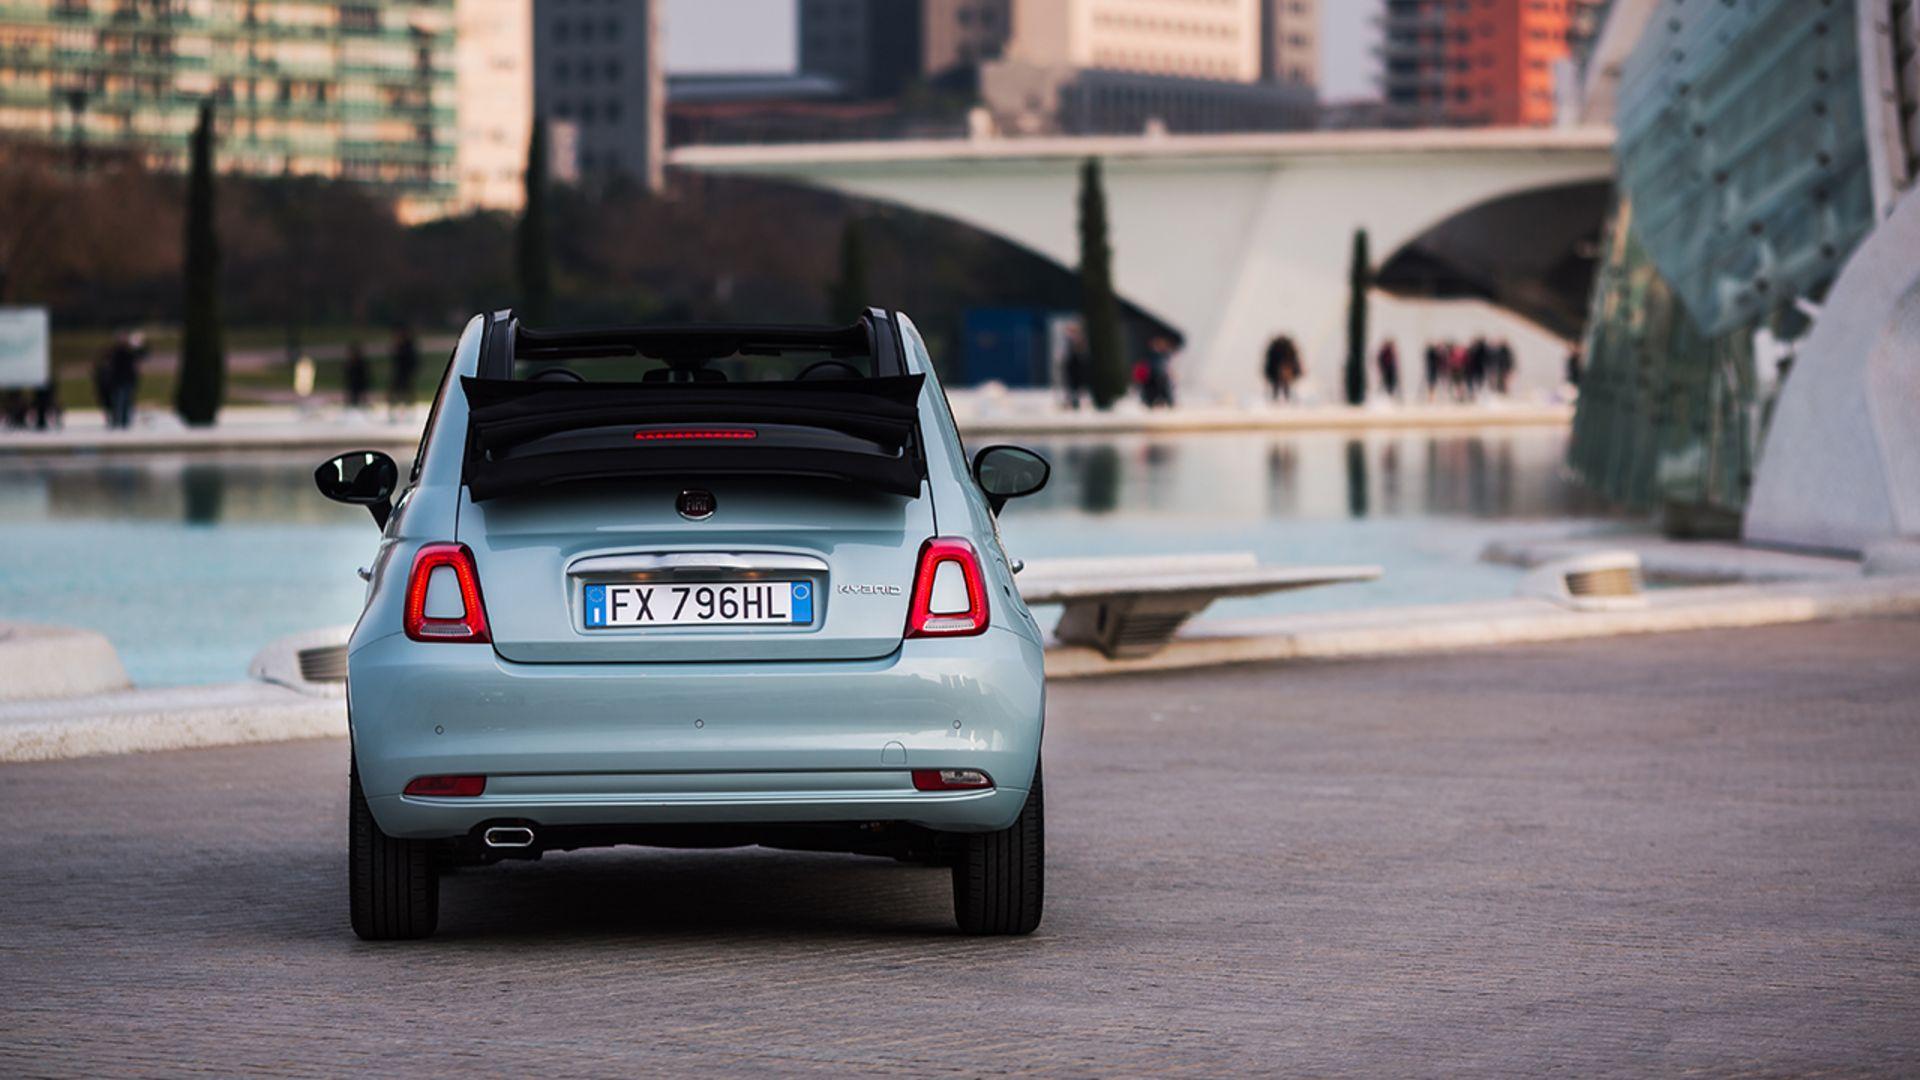 Fiat 500 mild hybrid pricing